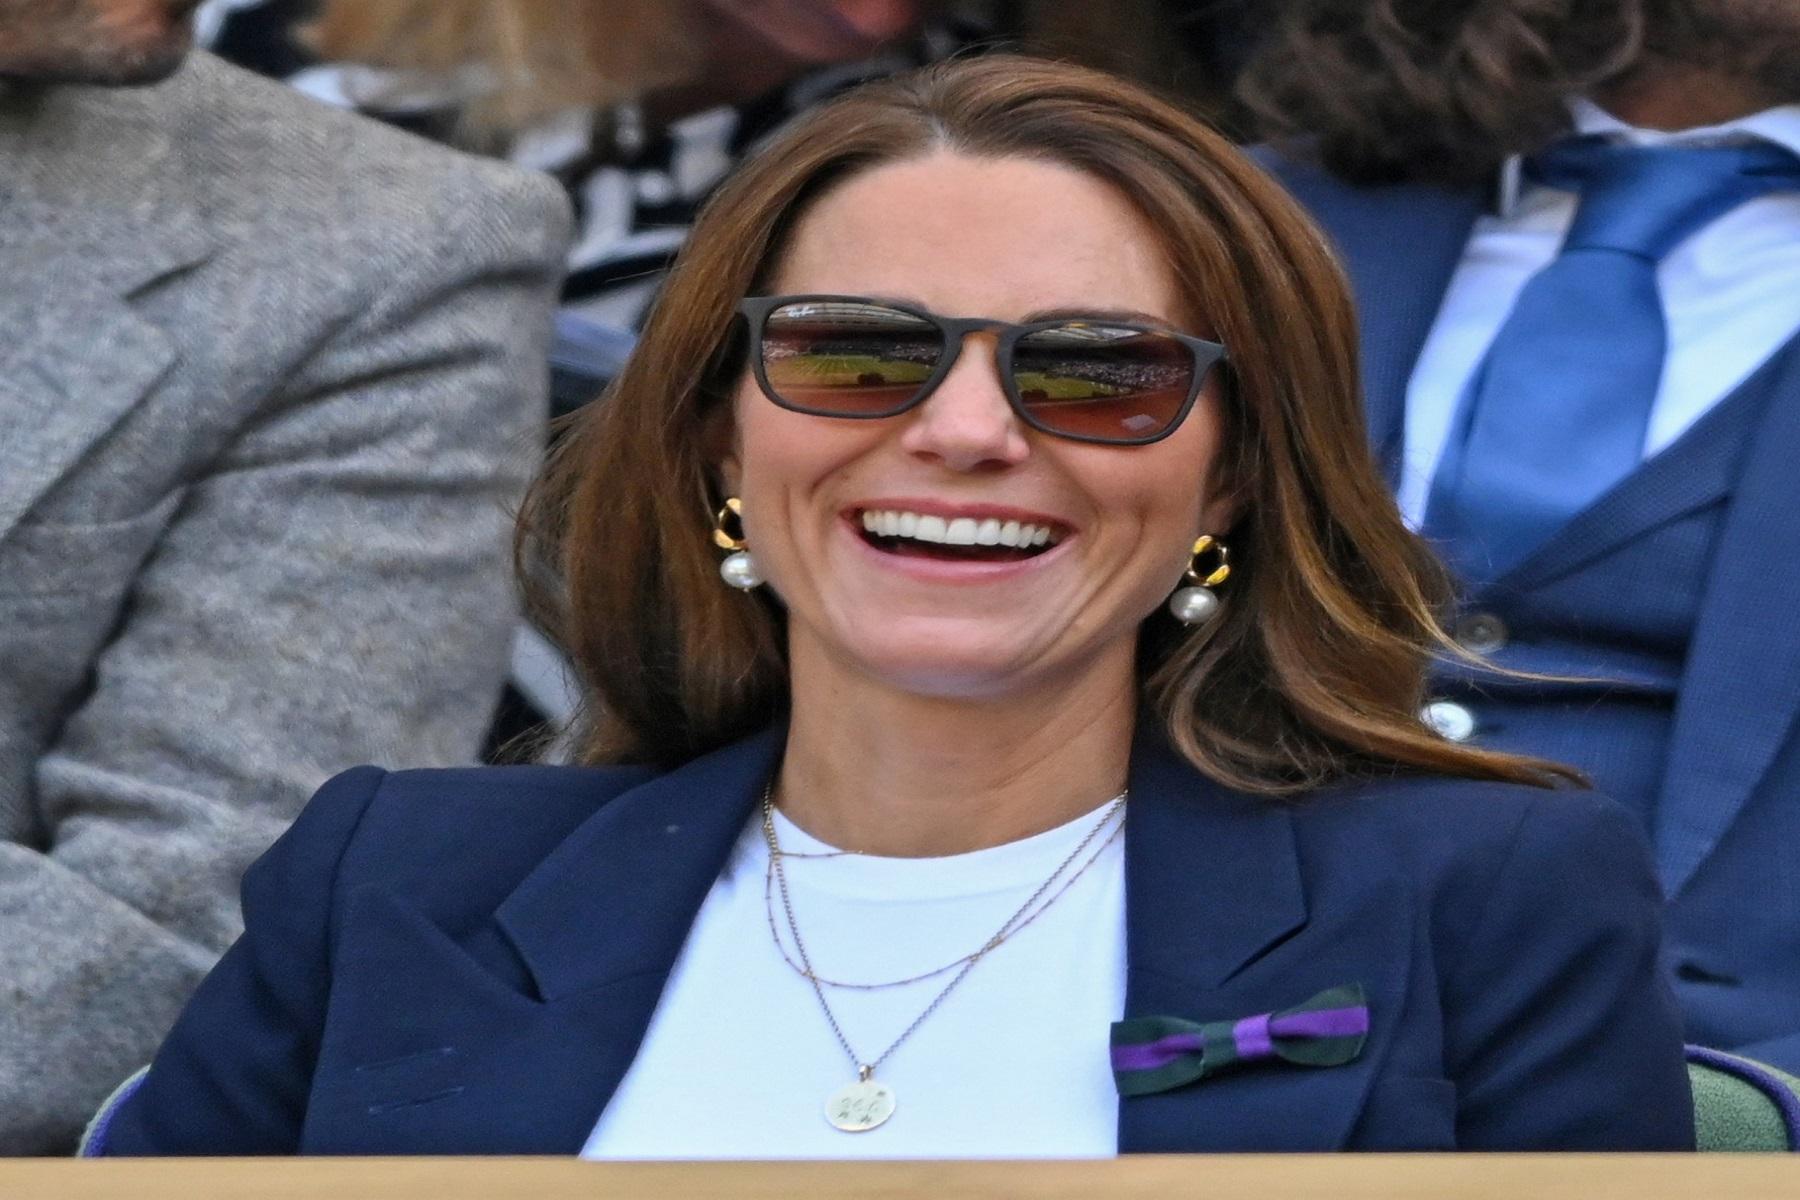 Kate Middleton: Βρίσκεται σε απομόνωση μετά από έκθεση σε κορωνοϊό, ενώ «δεν εμφανίζει συμπτώματα»